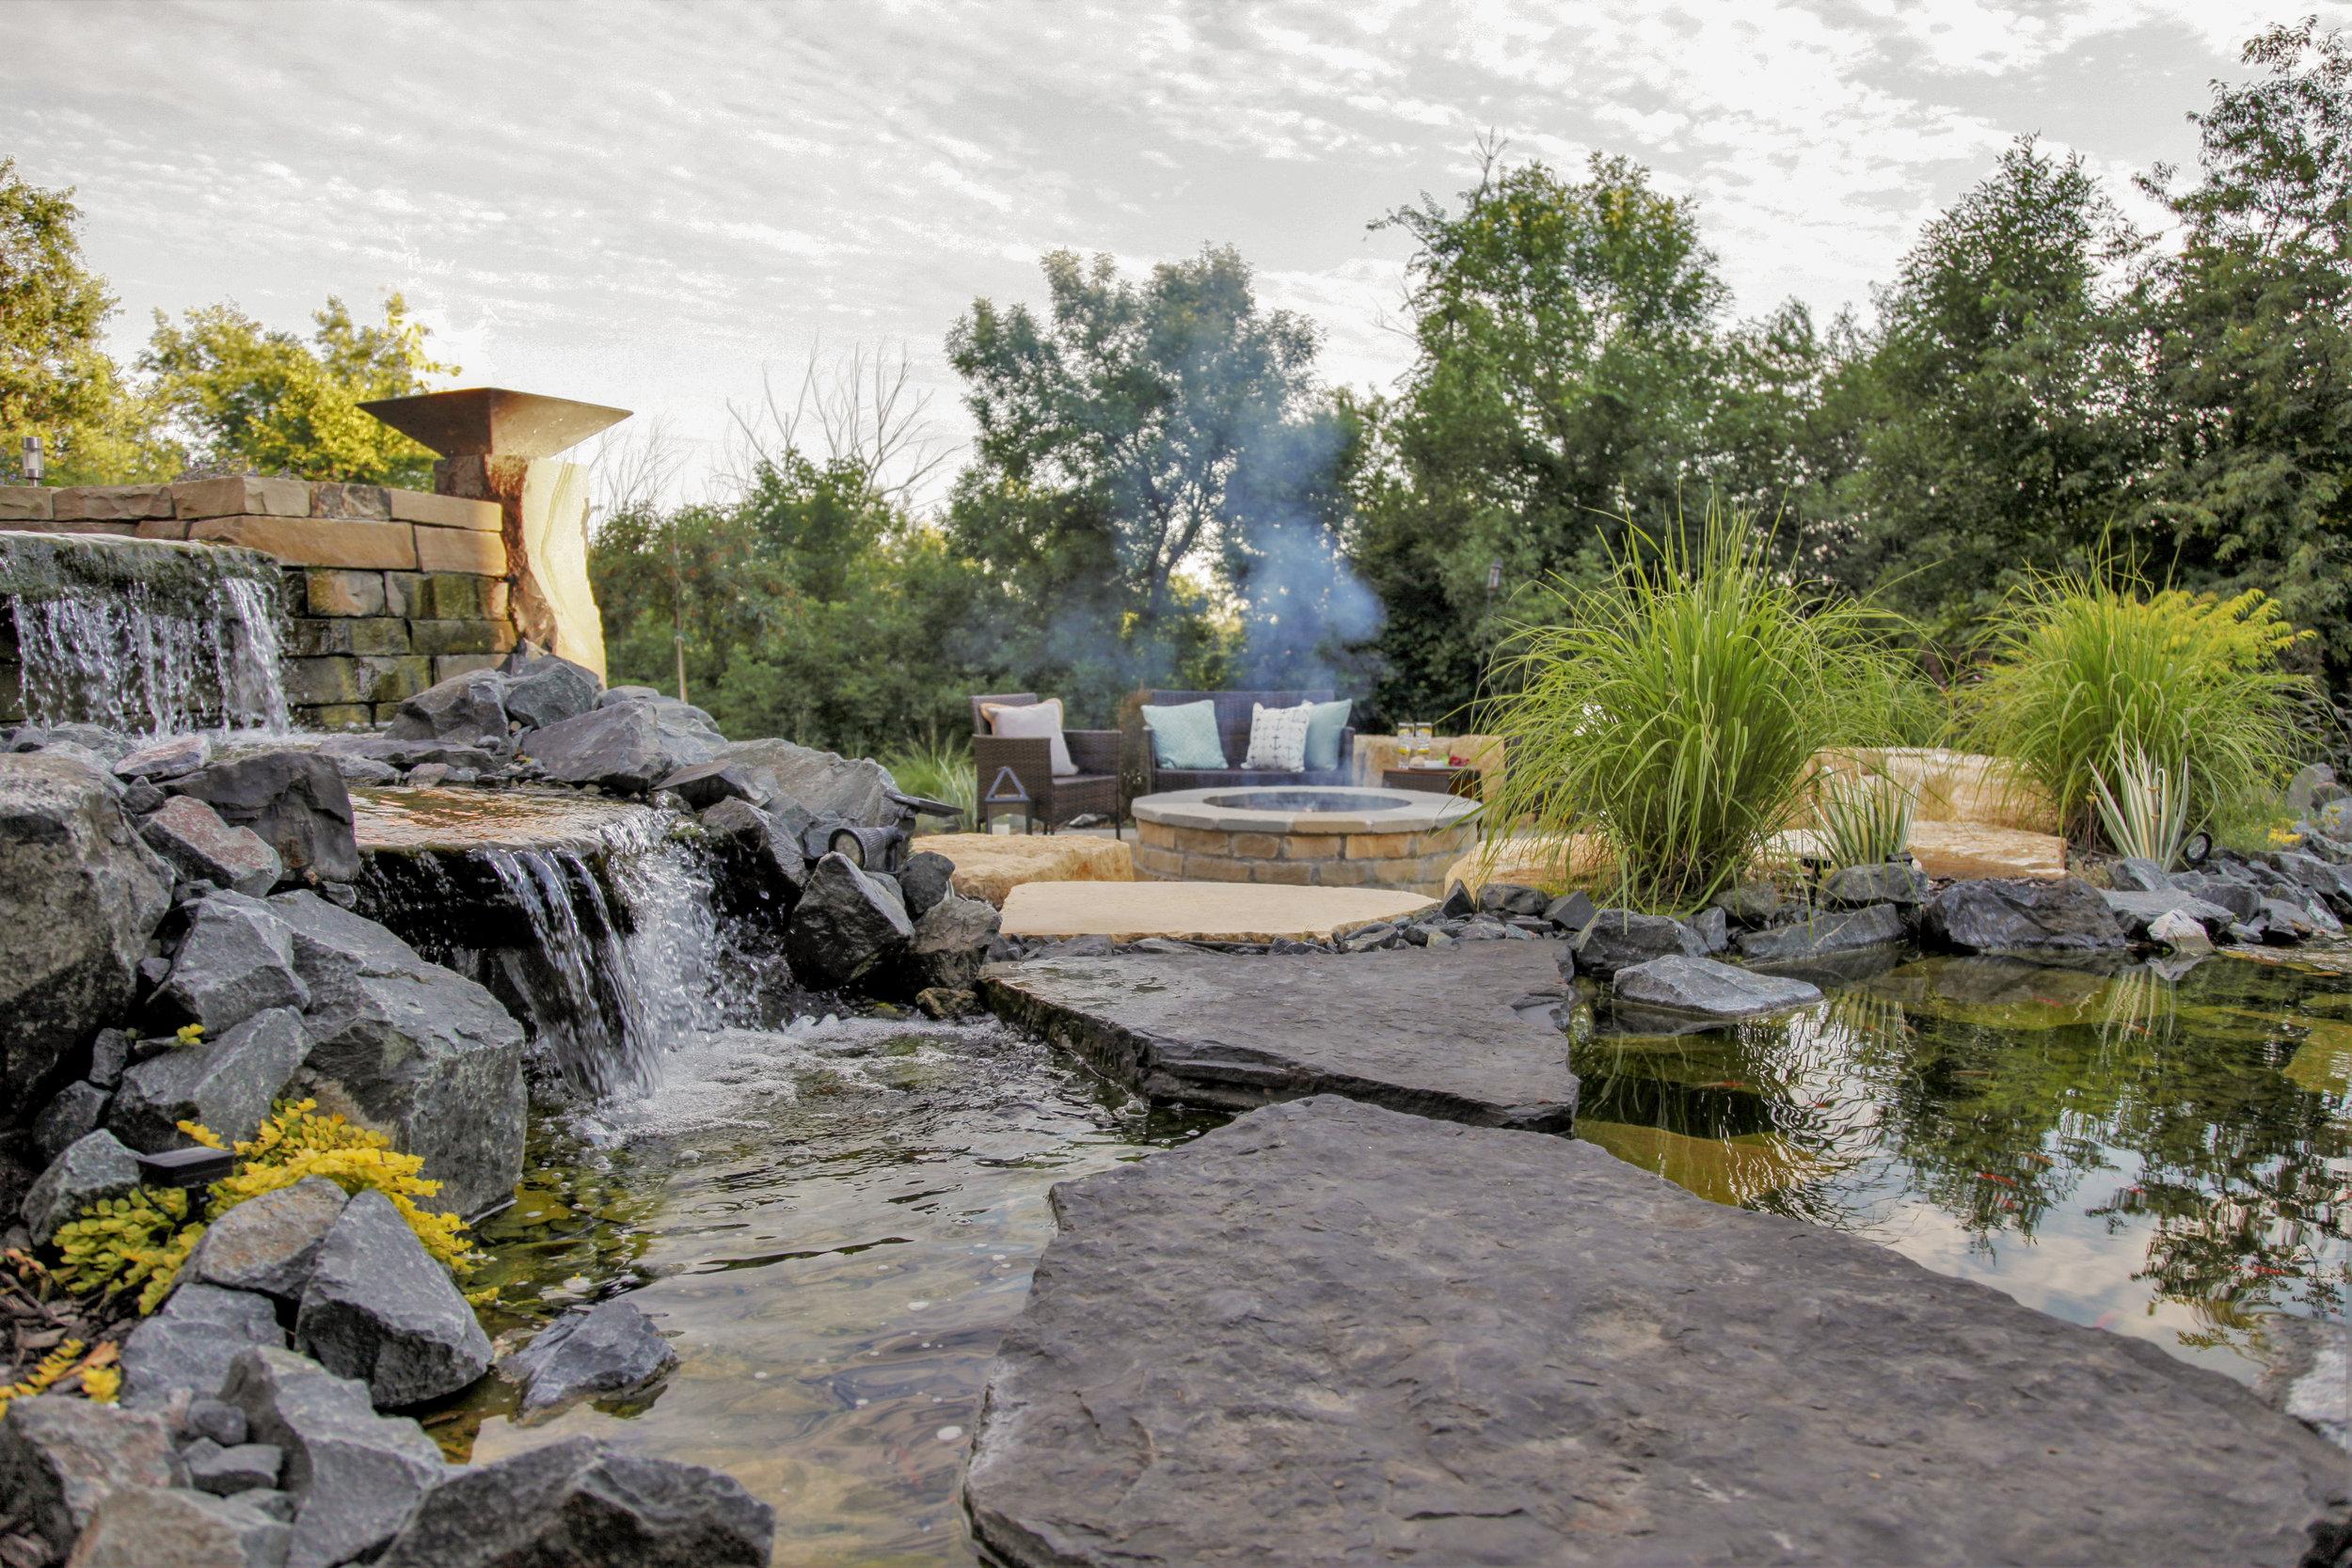 Moms Design Build - Water Feature Landscape Remodel.jpg